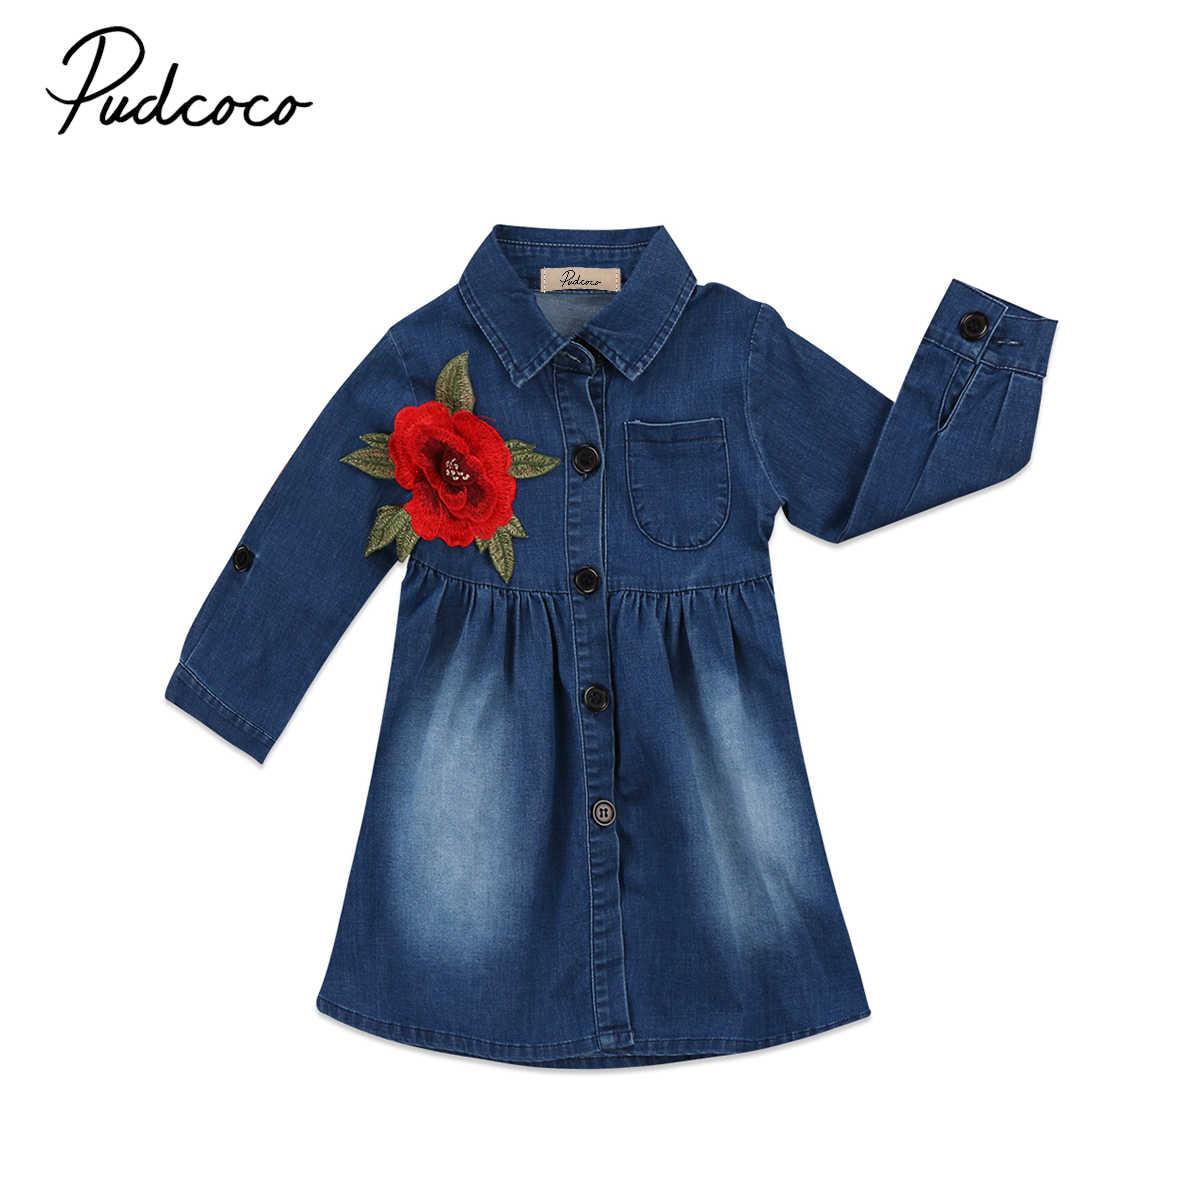 d9480a95fef 2018 Cute Infant Toddler Kid Baby Girls Denim Flower Dress Babies Jeans  Princess Party Tutu Dresses